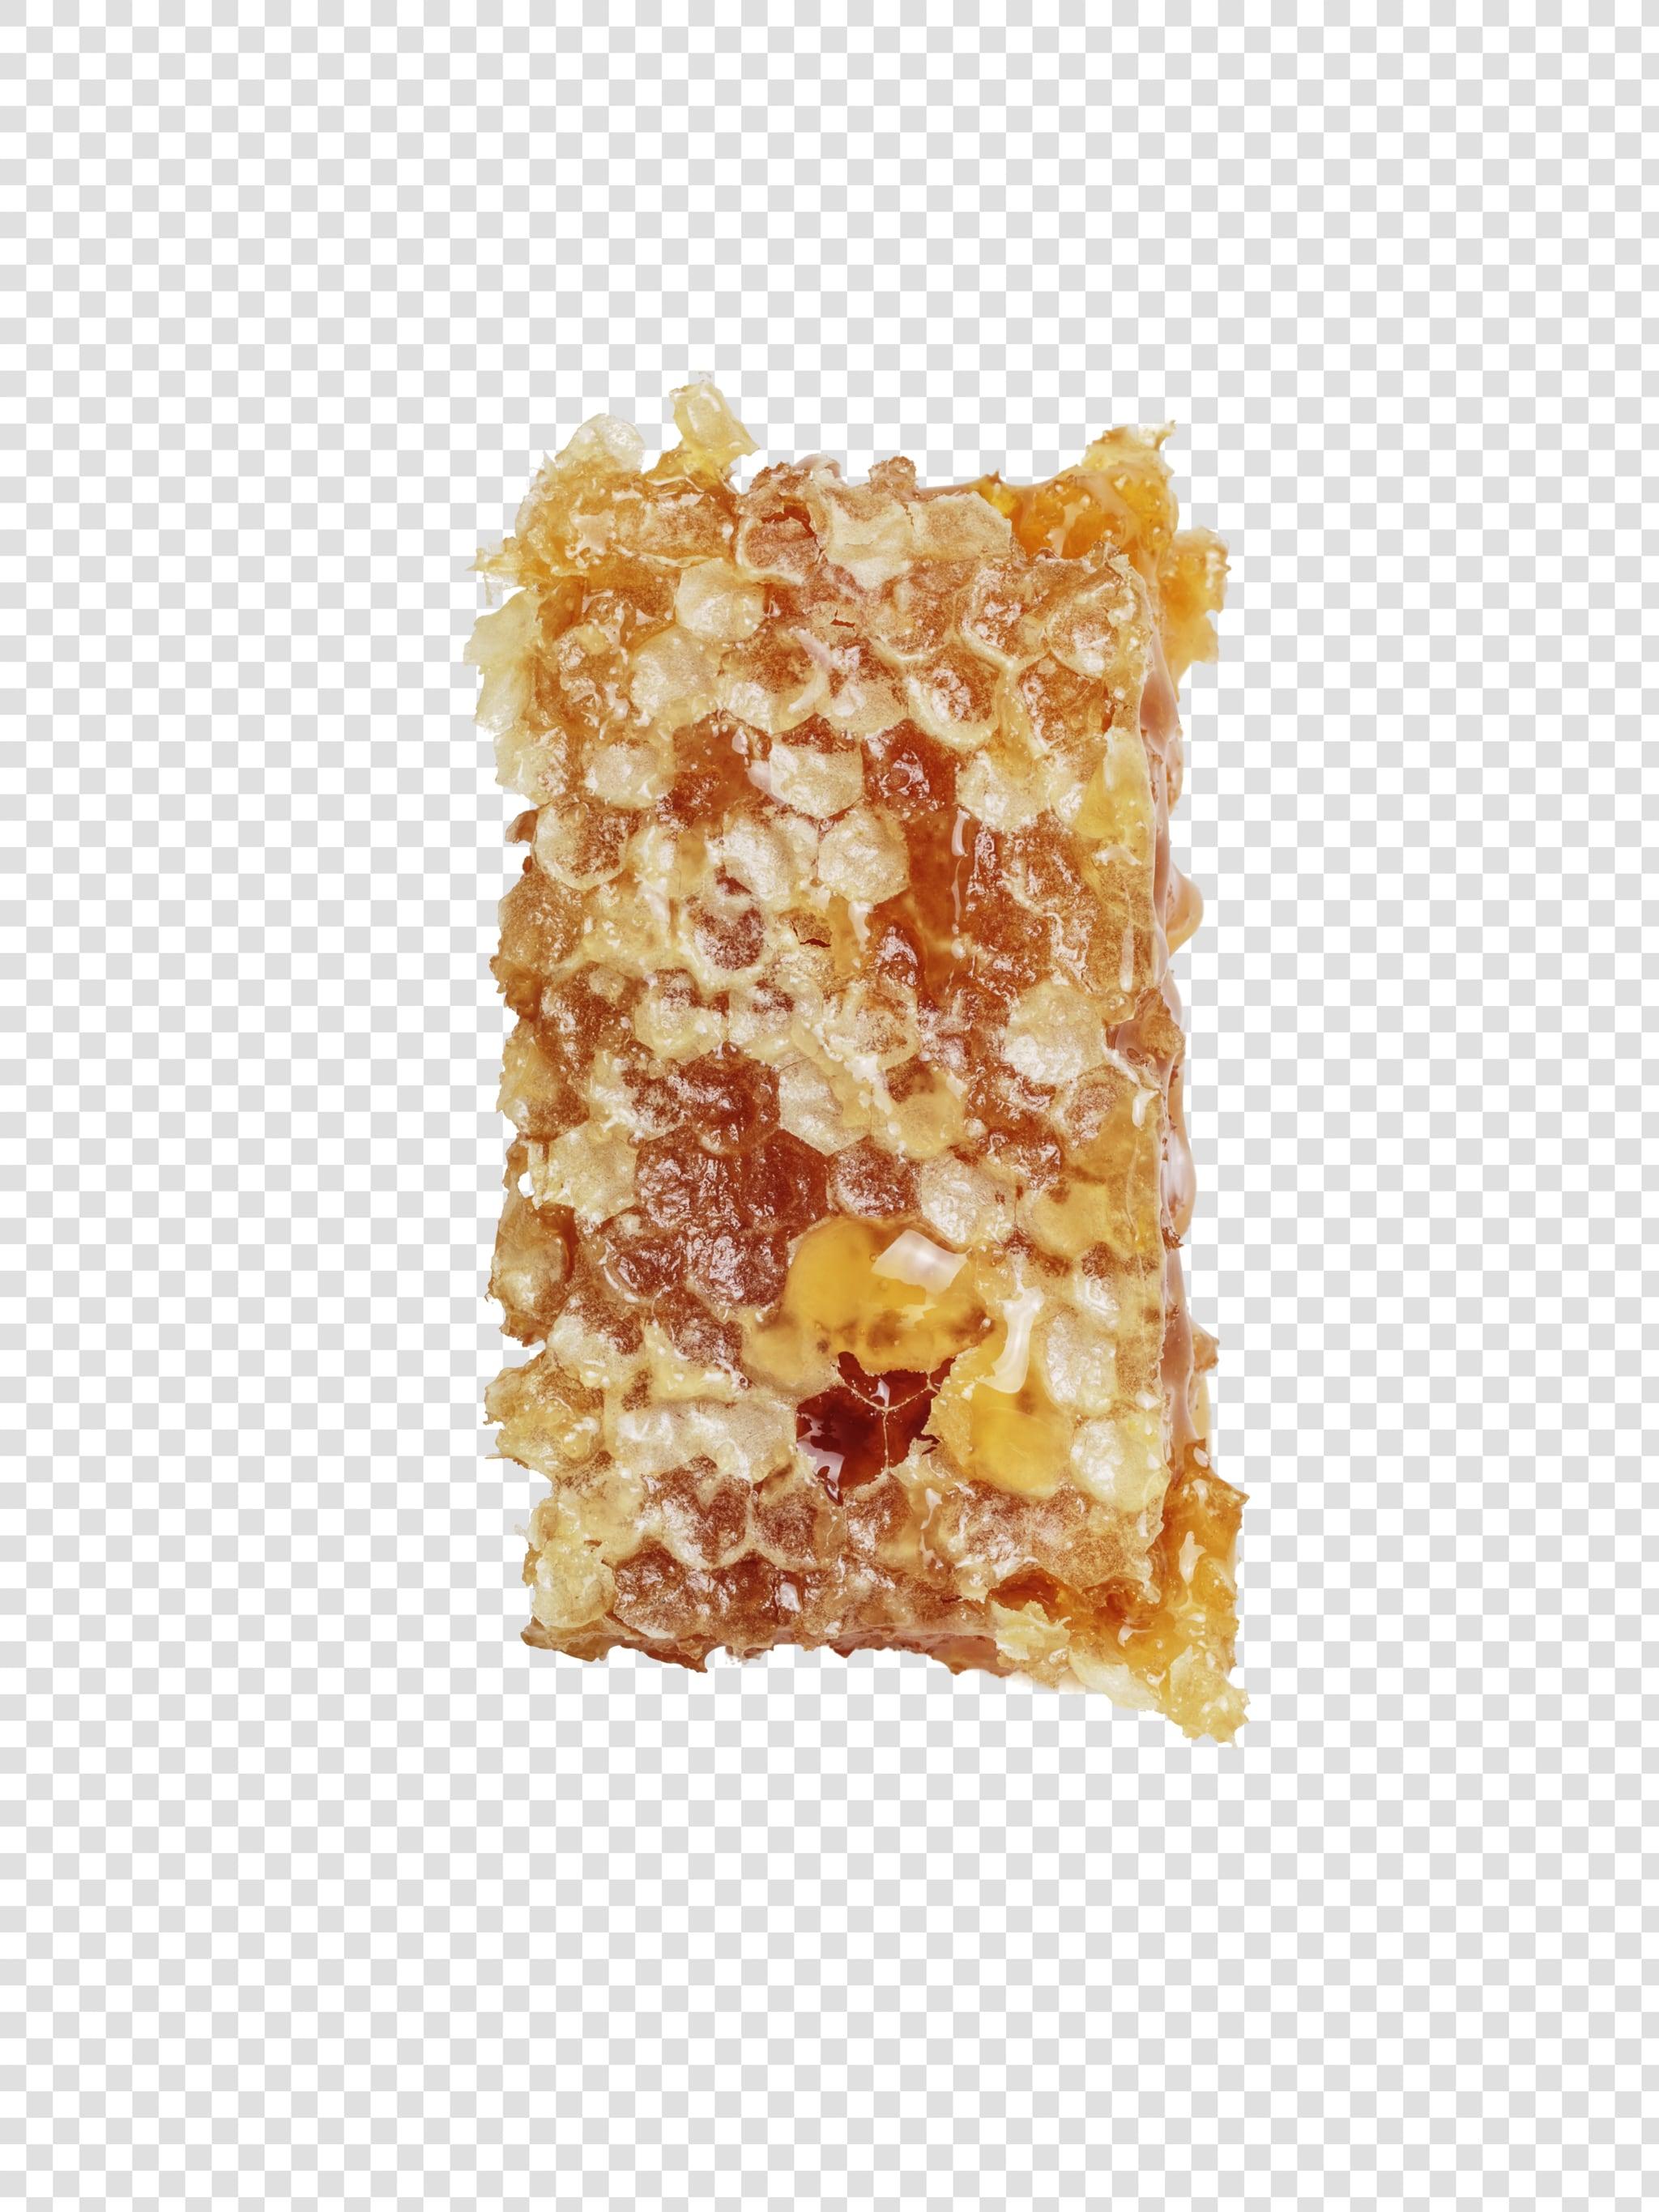 Honey PSD isolated image